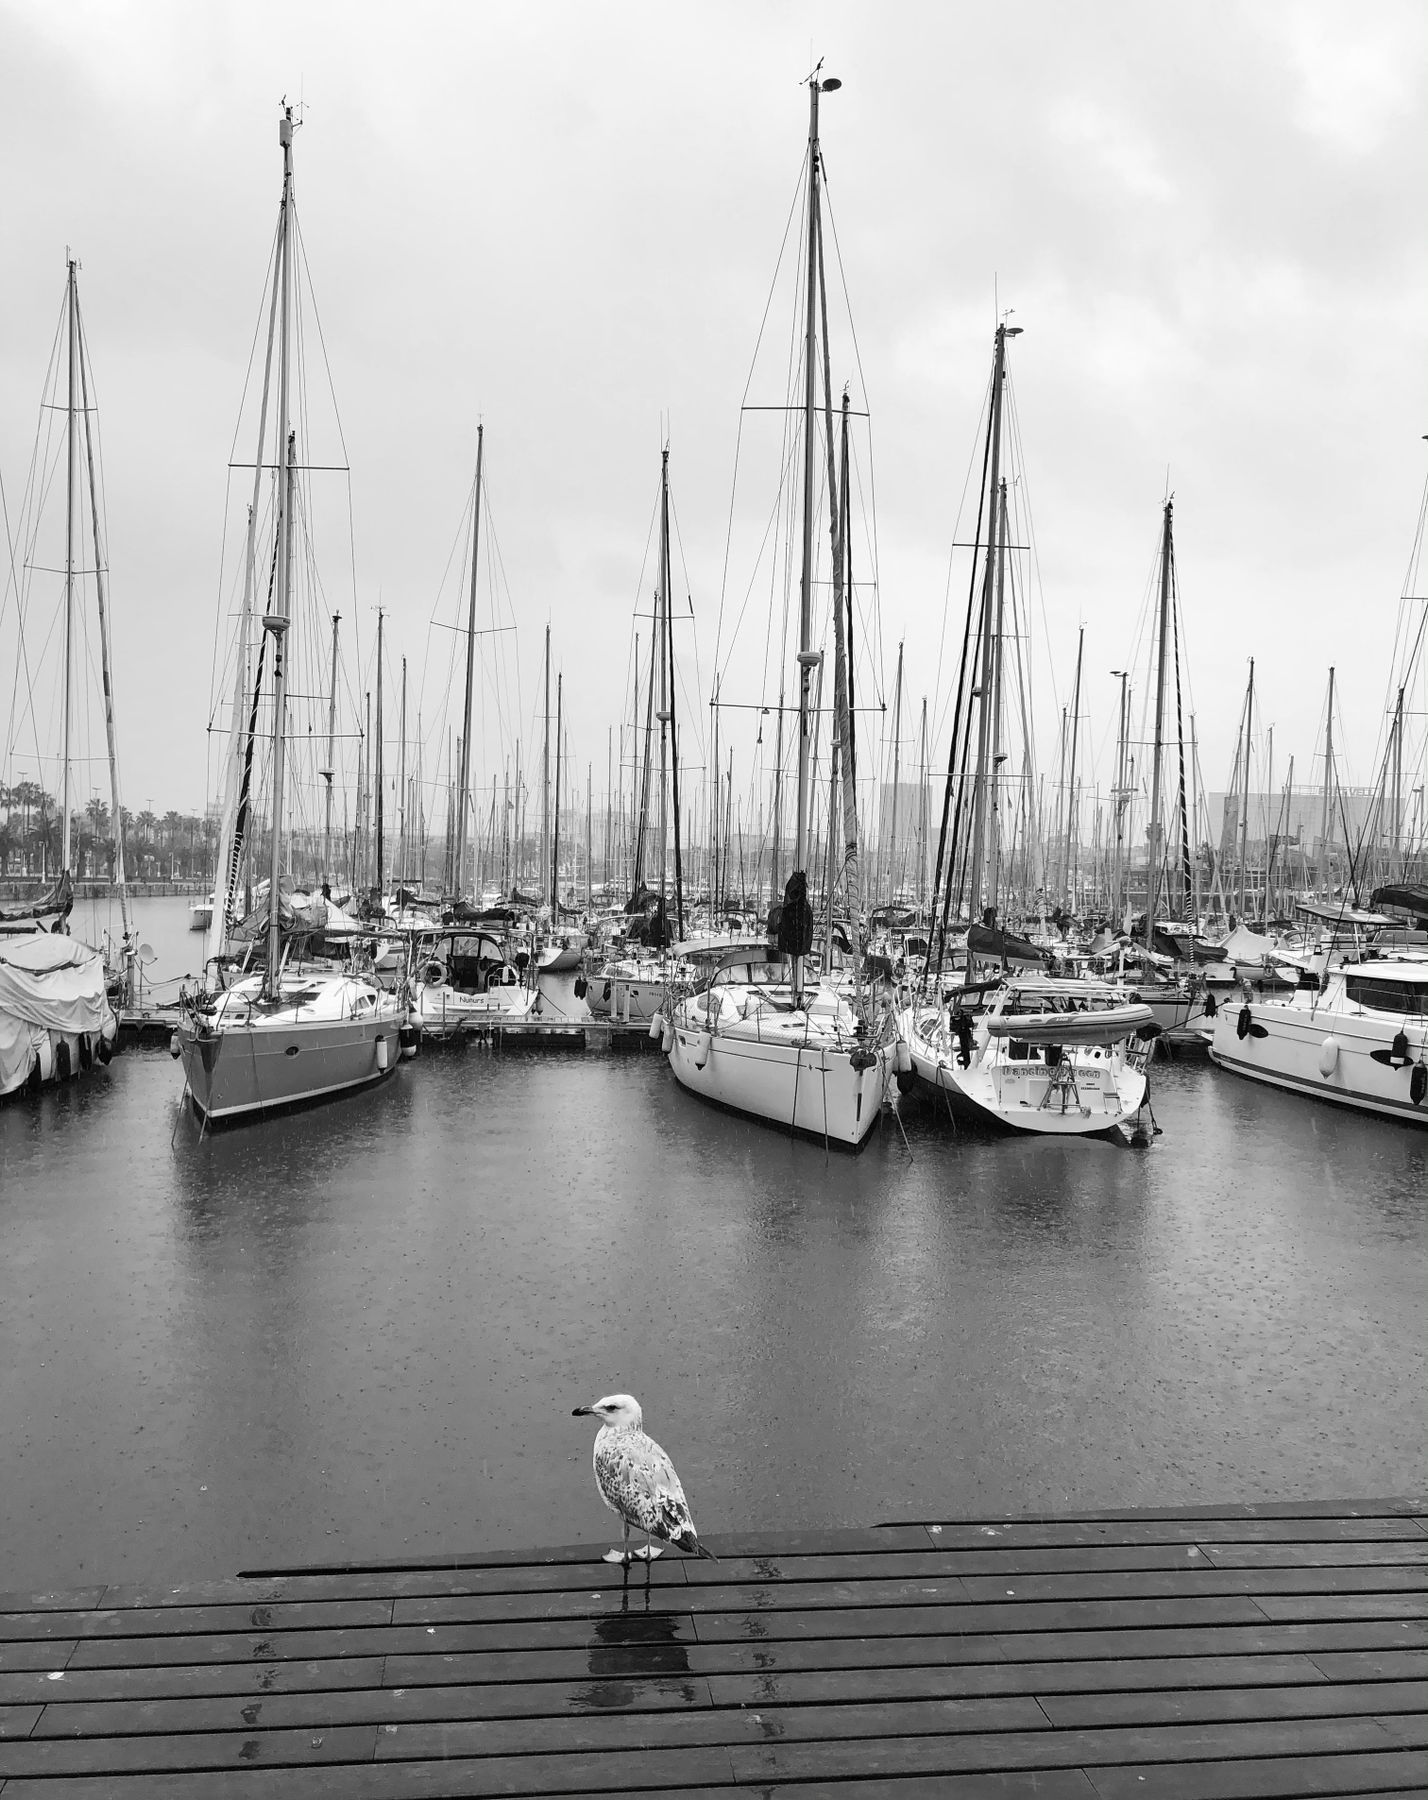 .rainy. barcelona seagull yachts